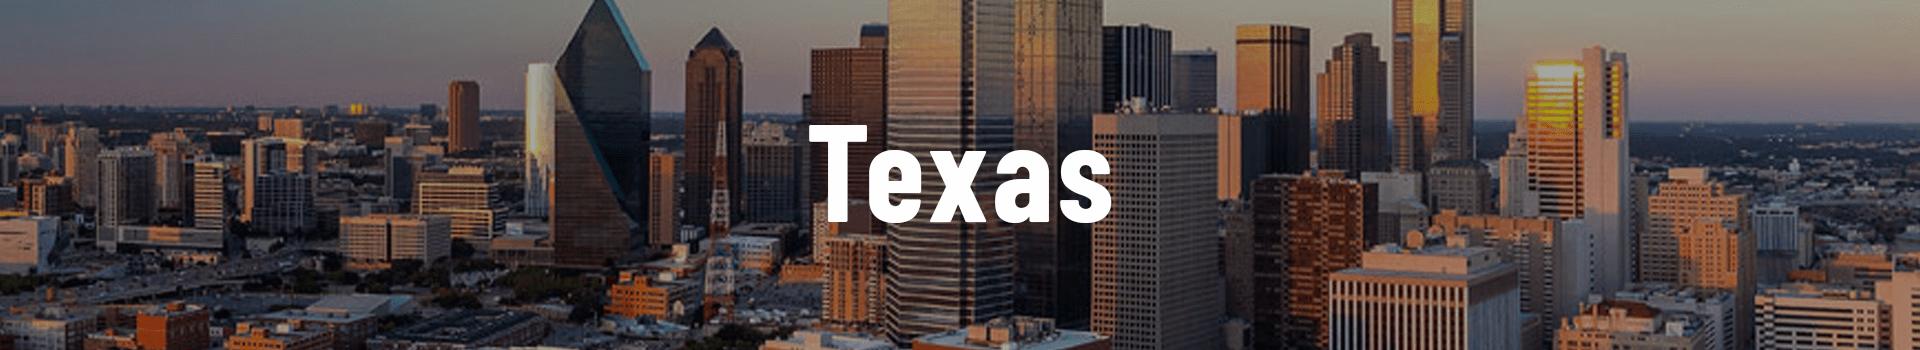 Texas, Texas Personal Injury Lawyer, Sierra Legal Group, Sierra Legal Group Texas, TX Personal Injury Attorney, Personal Injury Attorneys in Texas